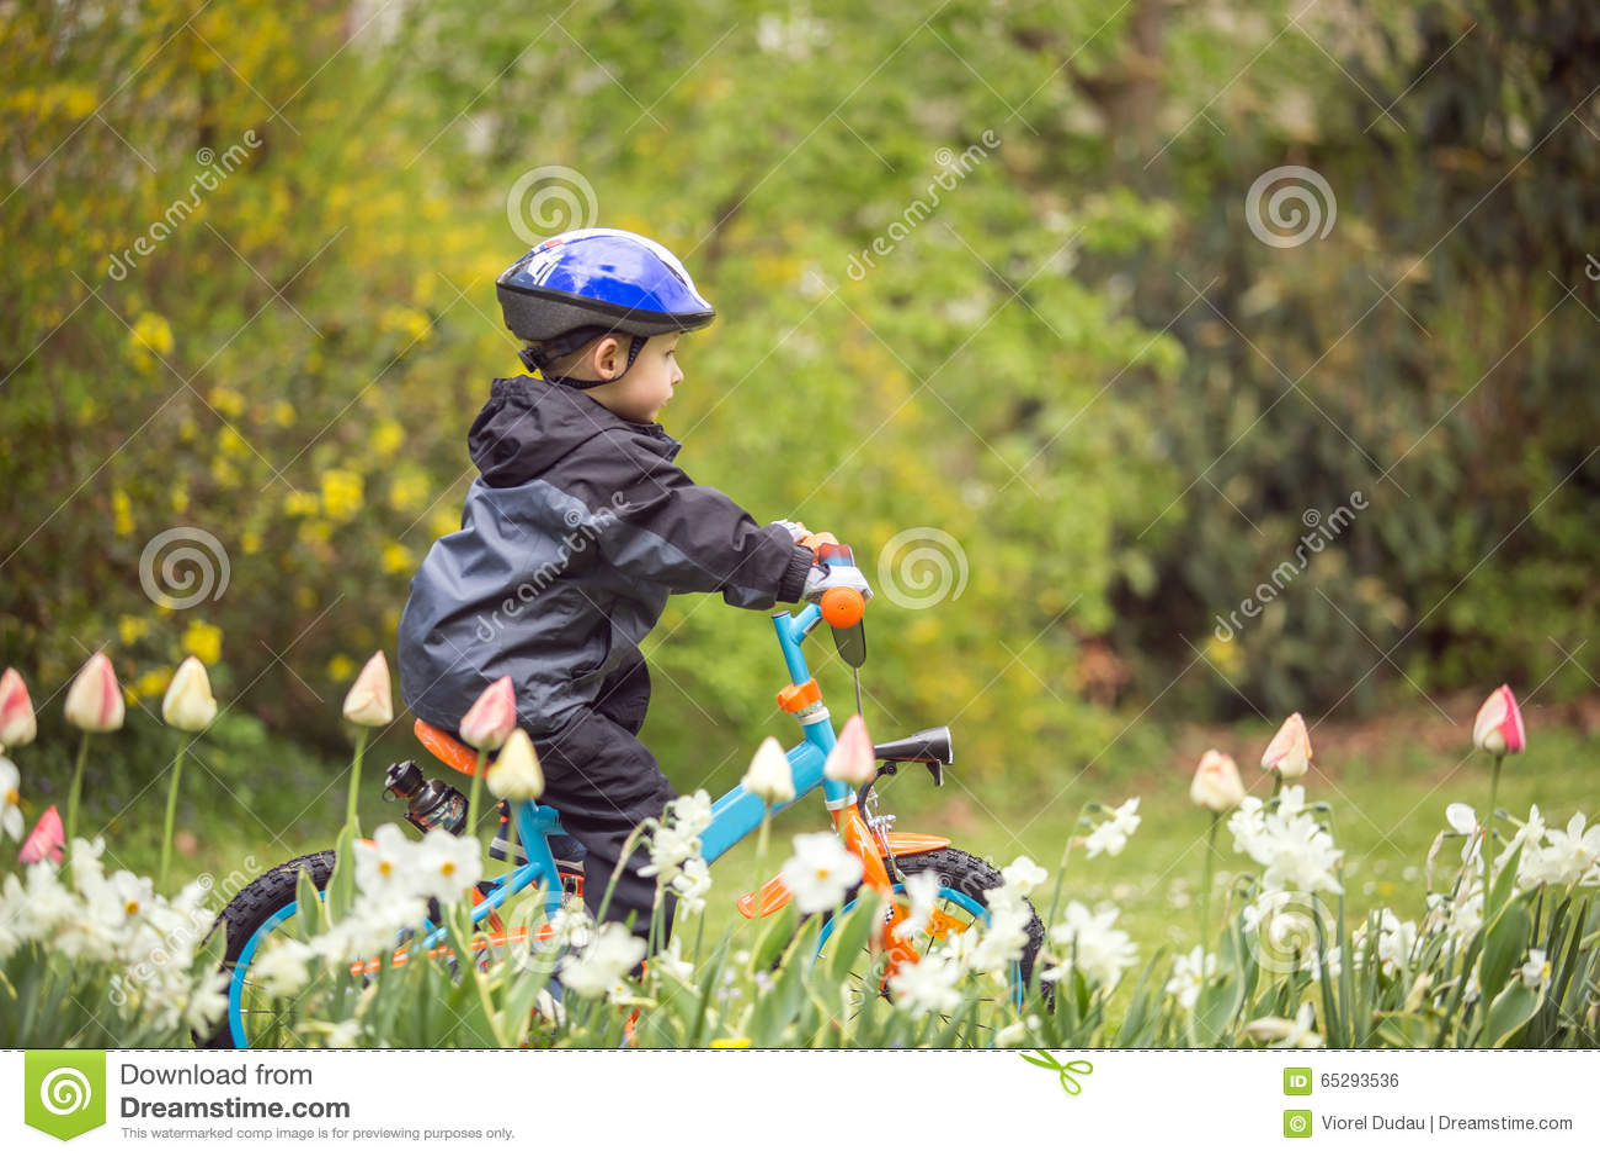 Http://www dreamstime COM/royalty-free-stock-photos-child-bike-park-rides-image55467868